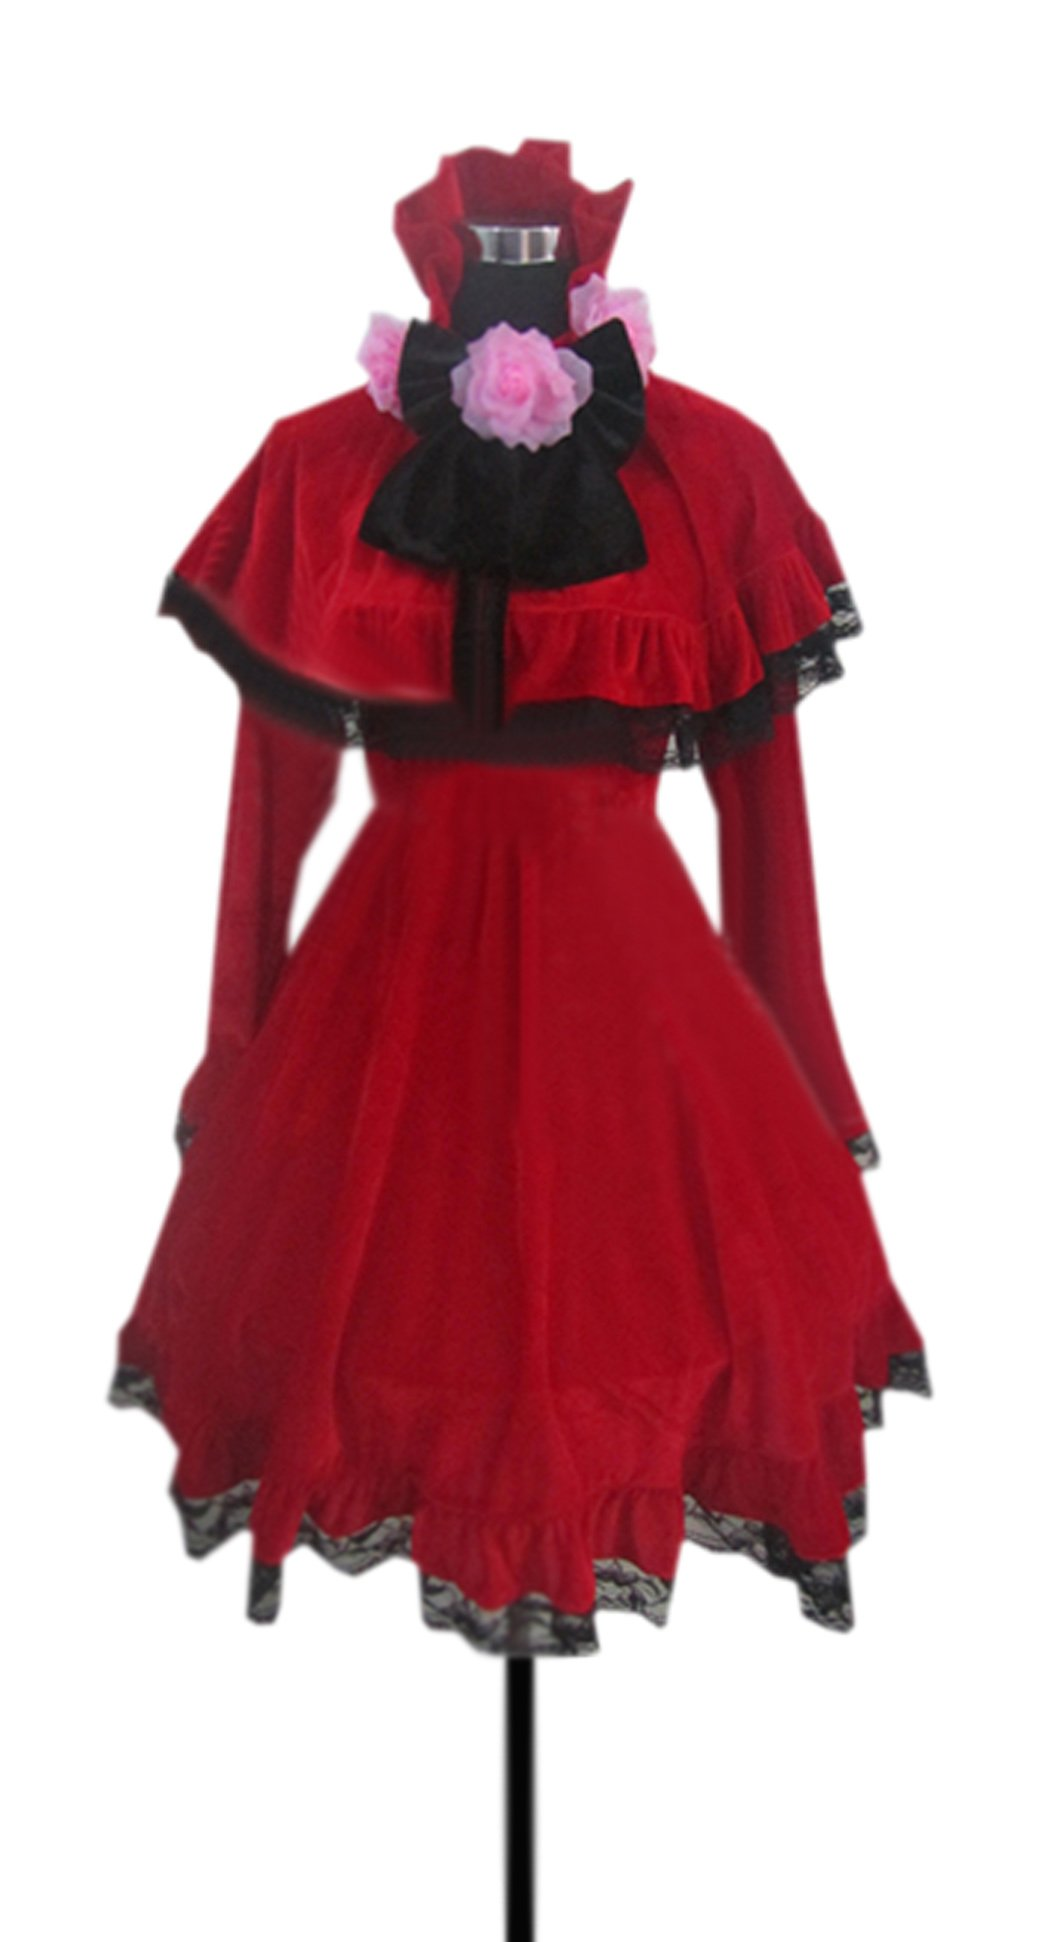 Dreamcosplay Rozen Maiden Shin ku Red Outfits Uniform Cosplay Costume